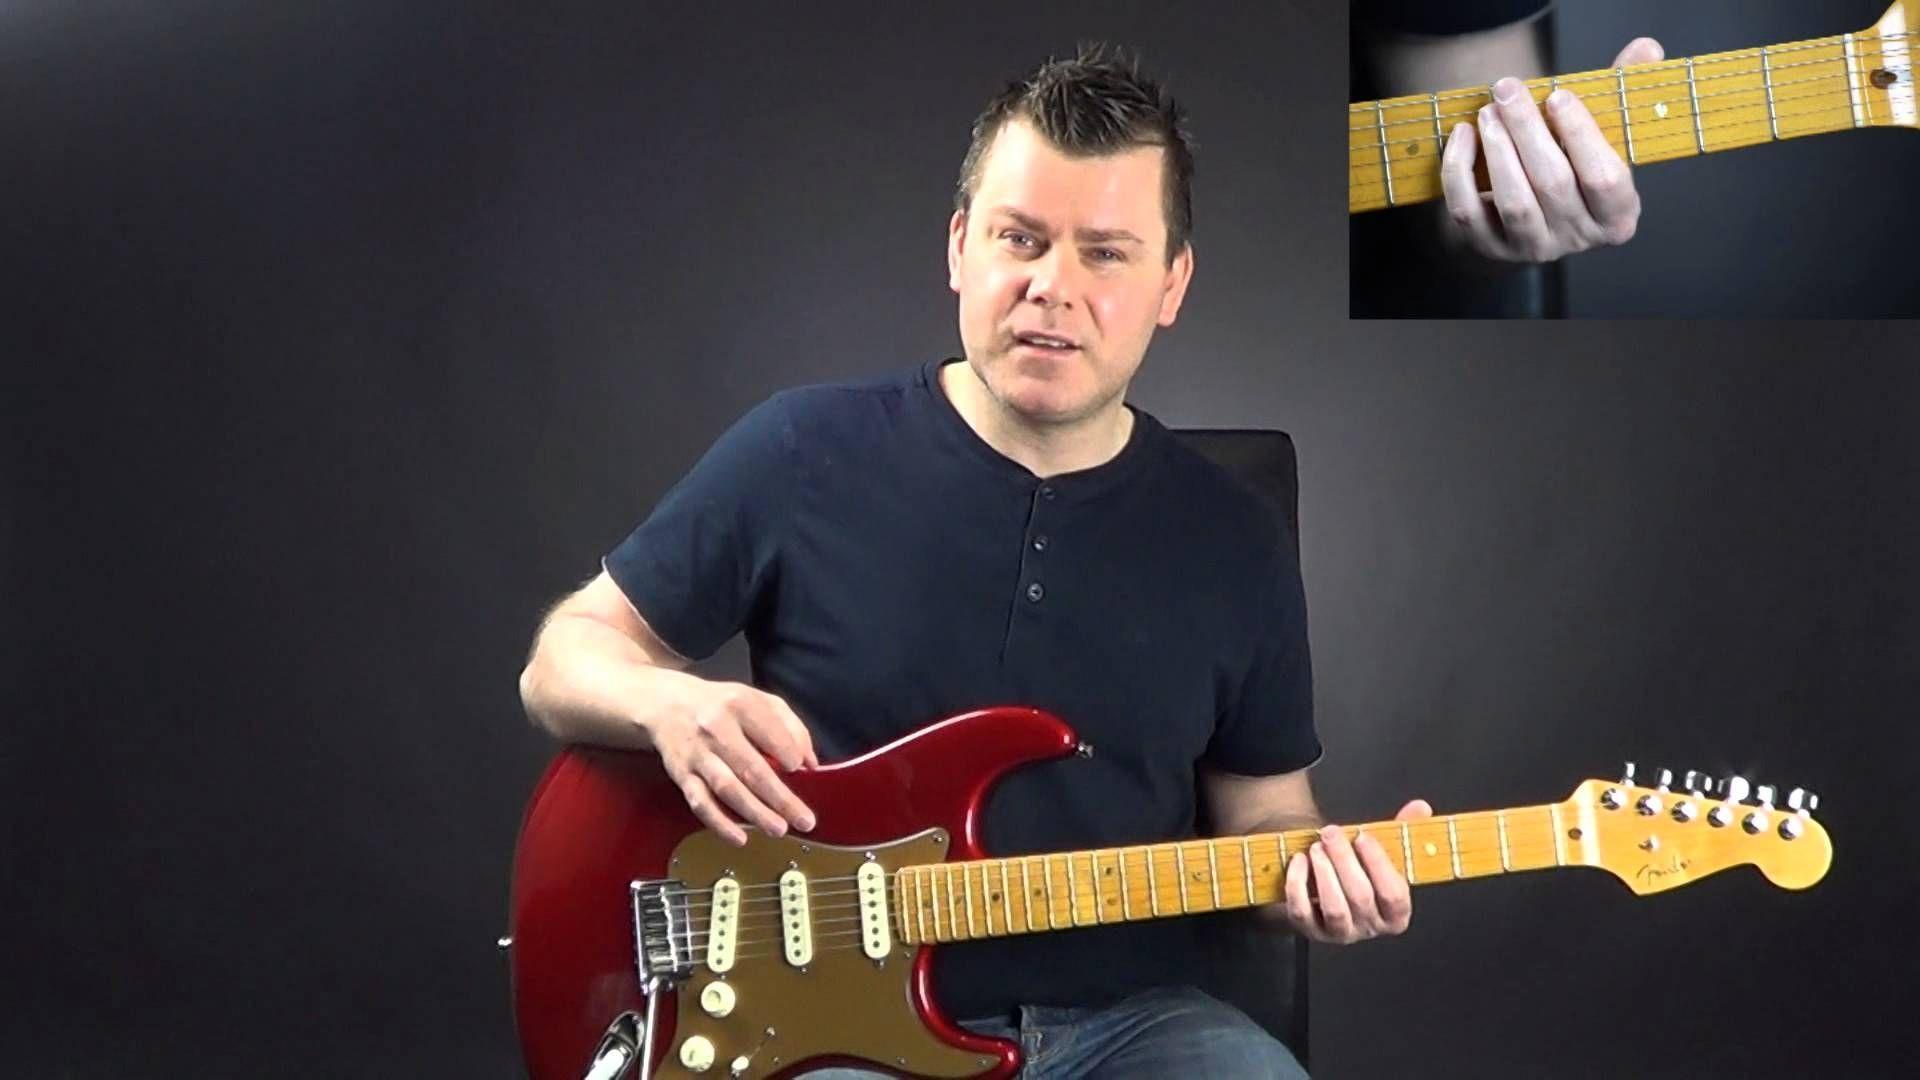 Sugar mice by marillion guitar lesson tutorial youtube.